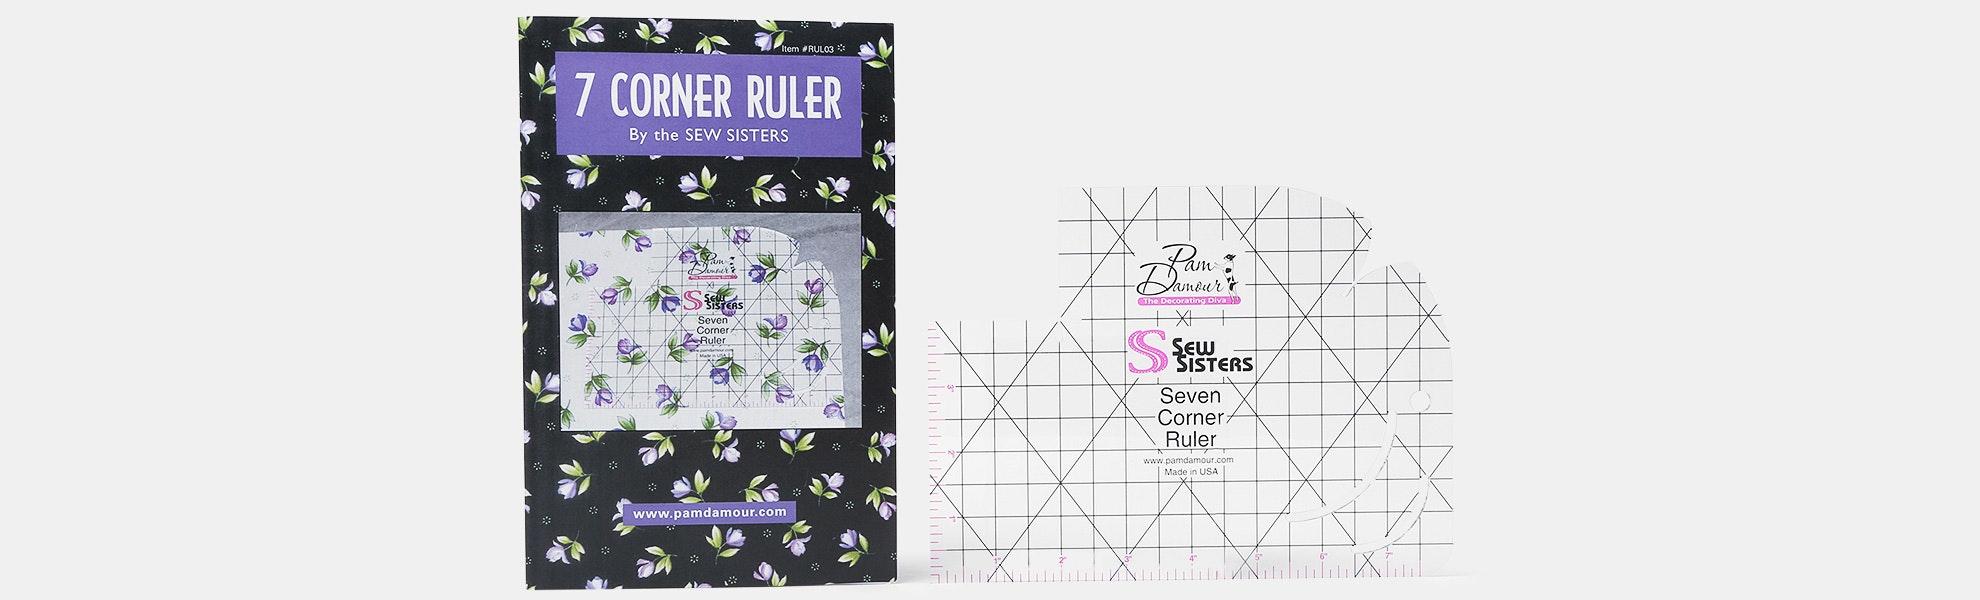 7-Corner Ruler